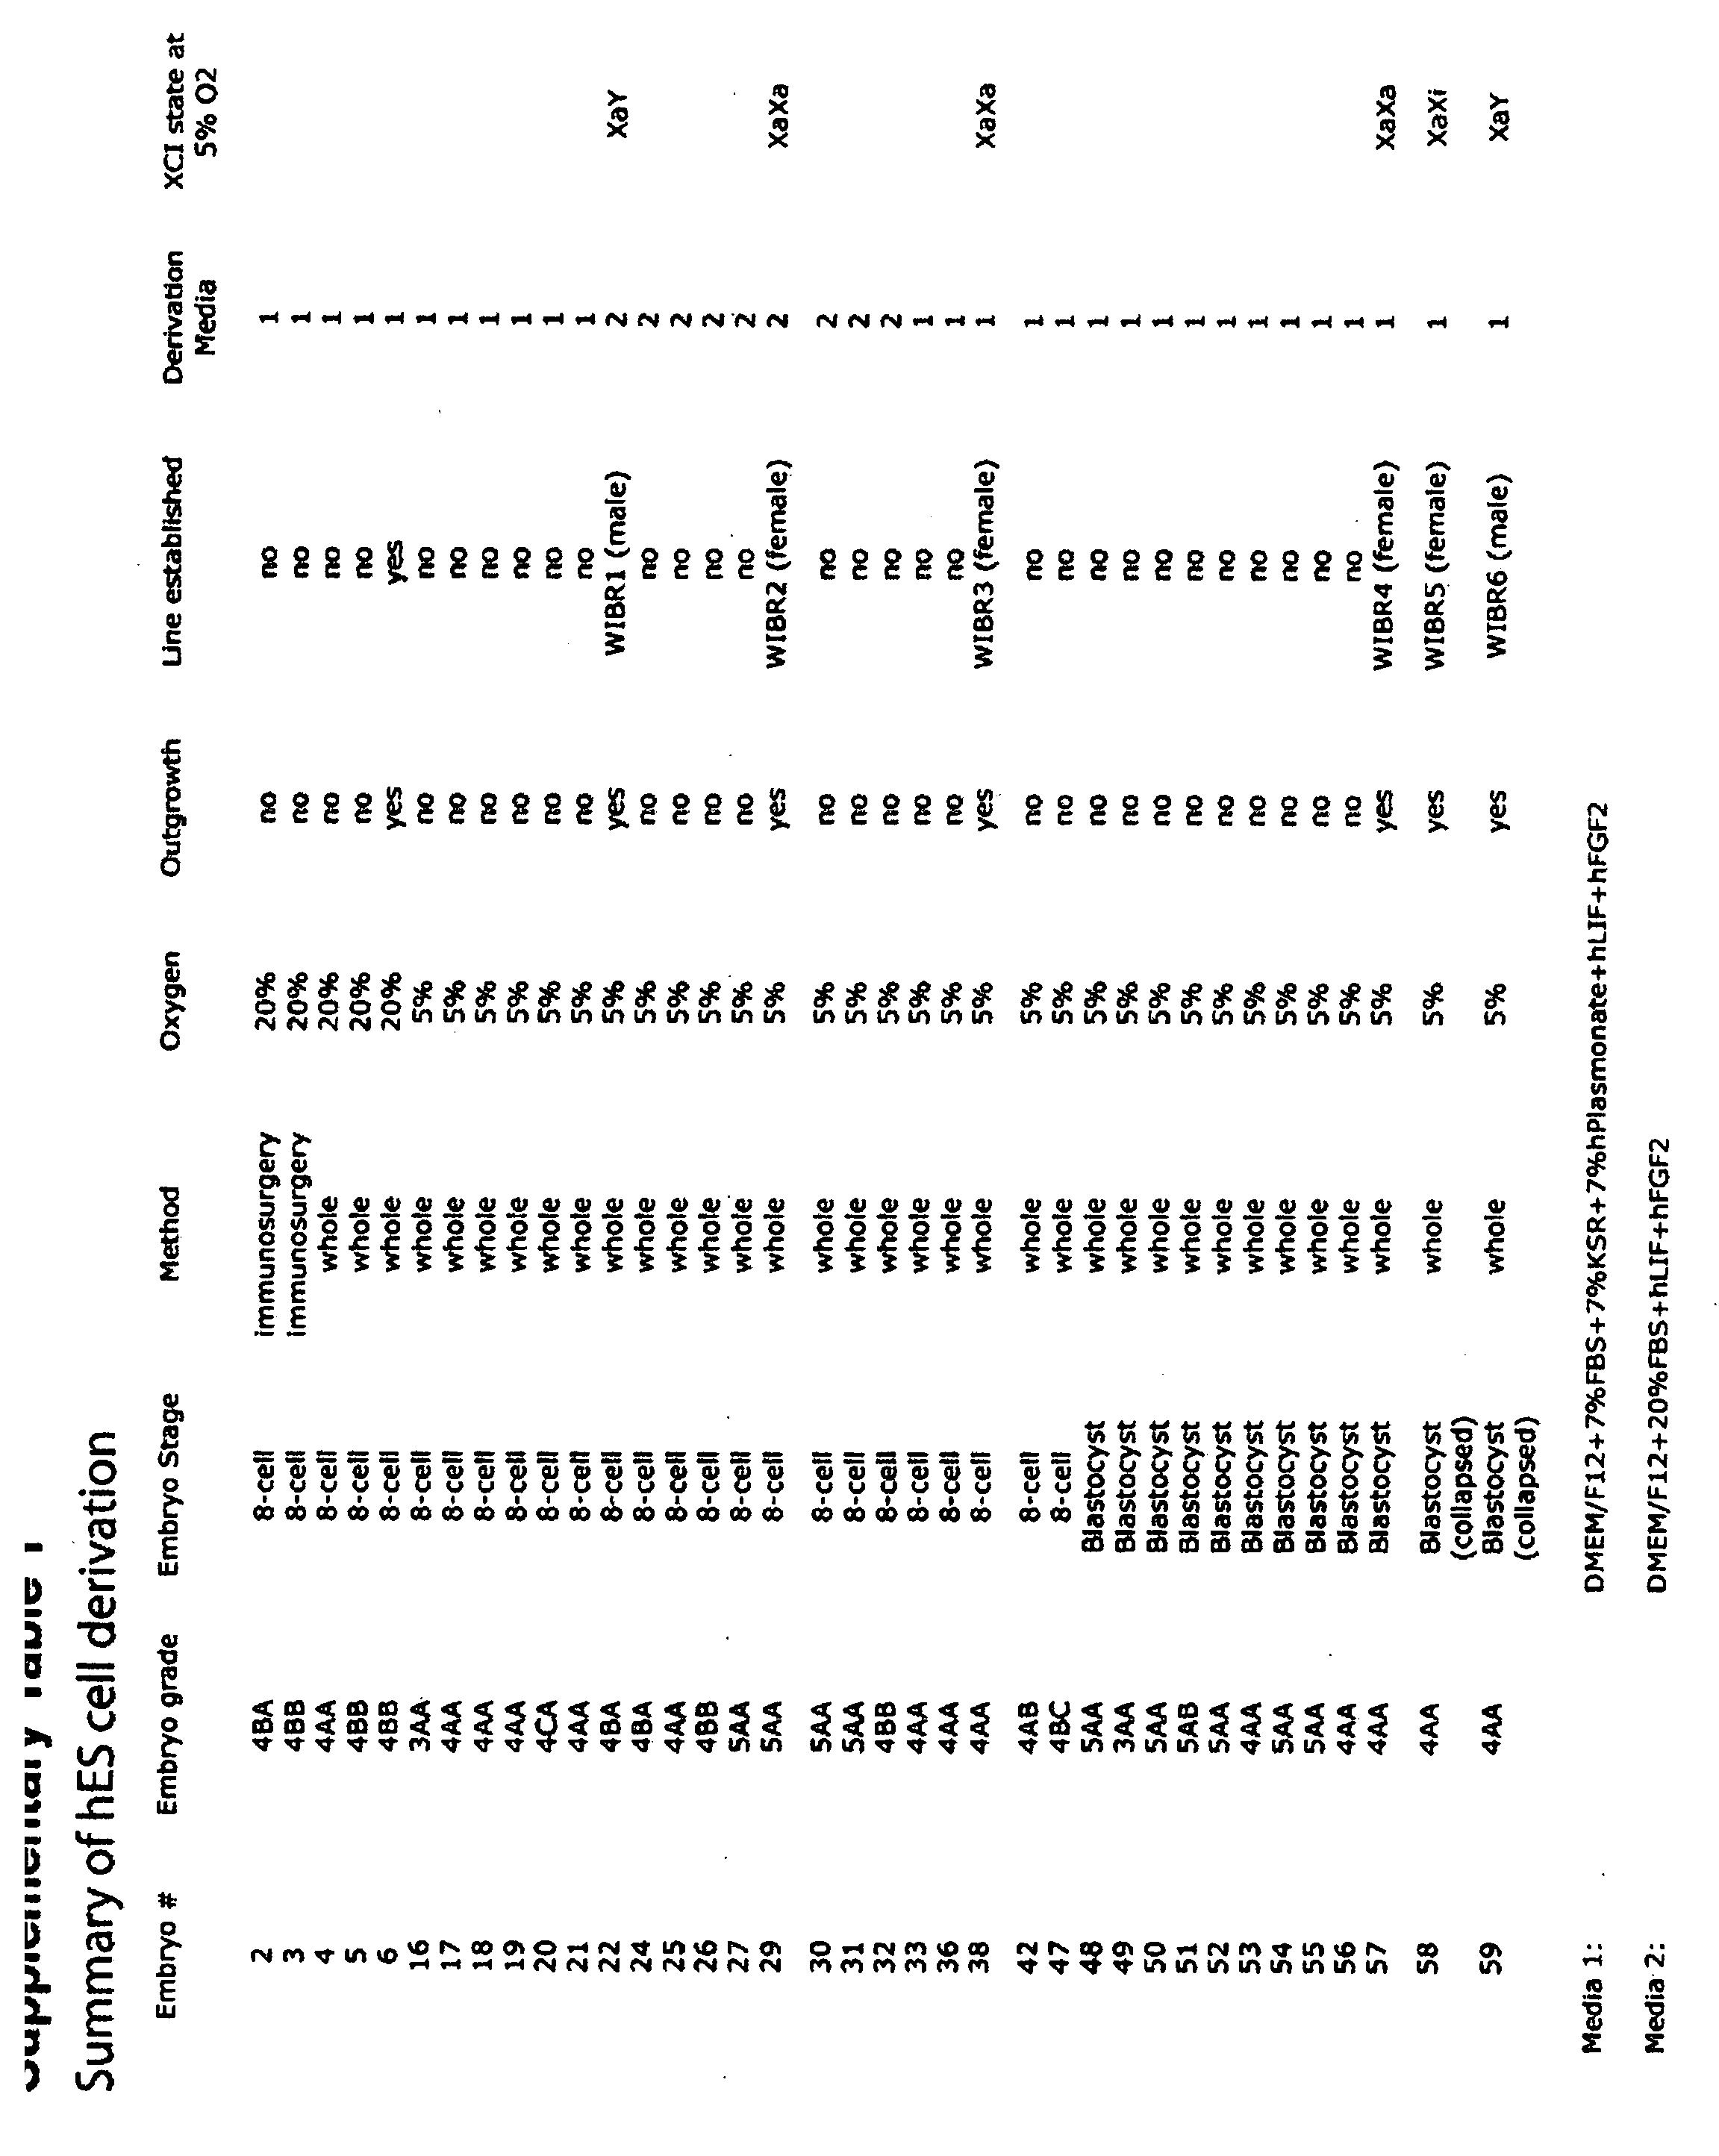 WO2011142832A2 - Stem cells derived under low oxygen